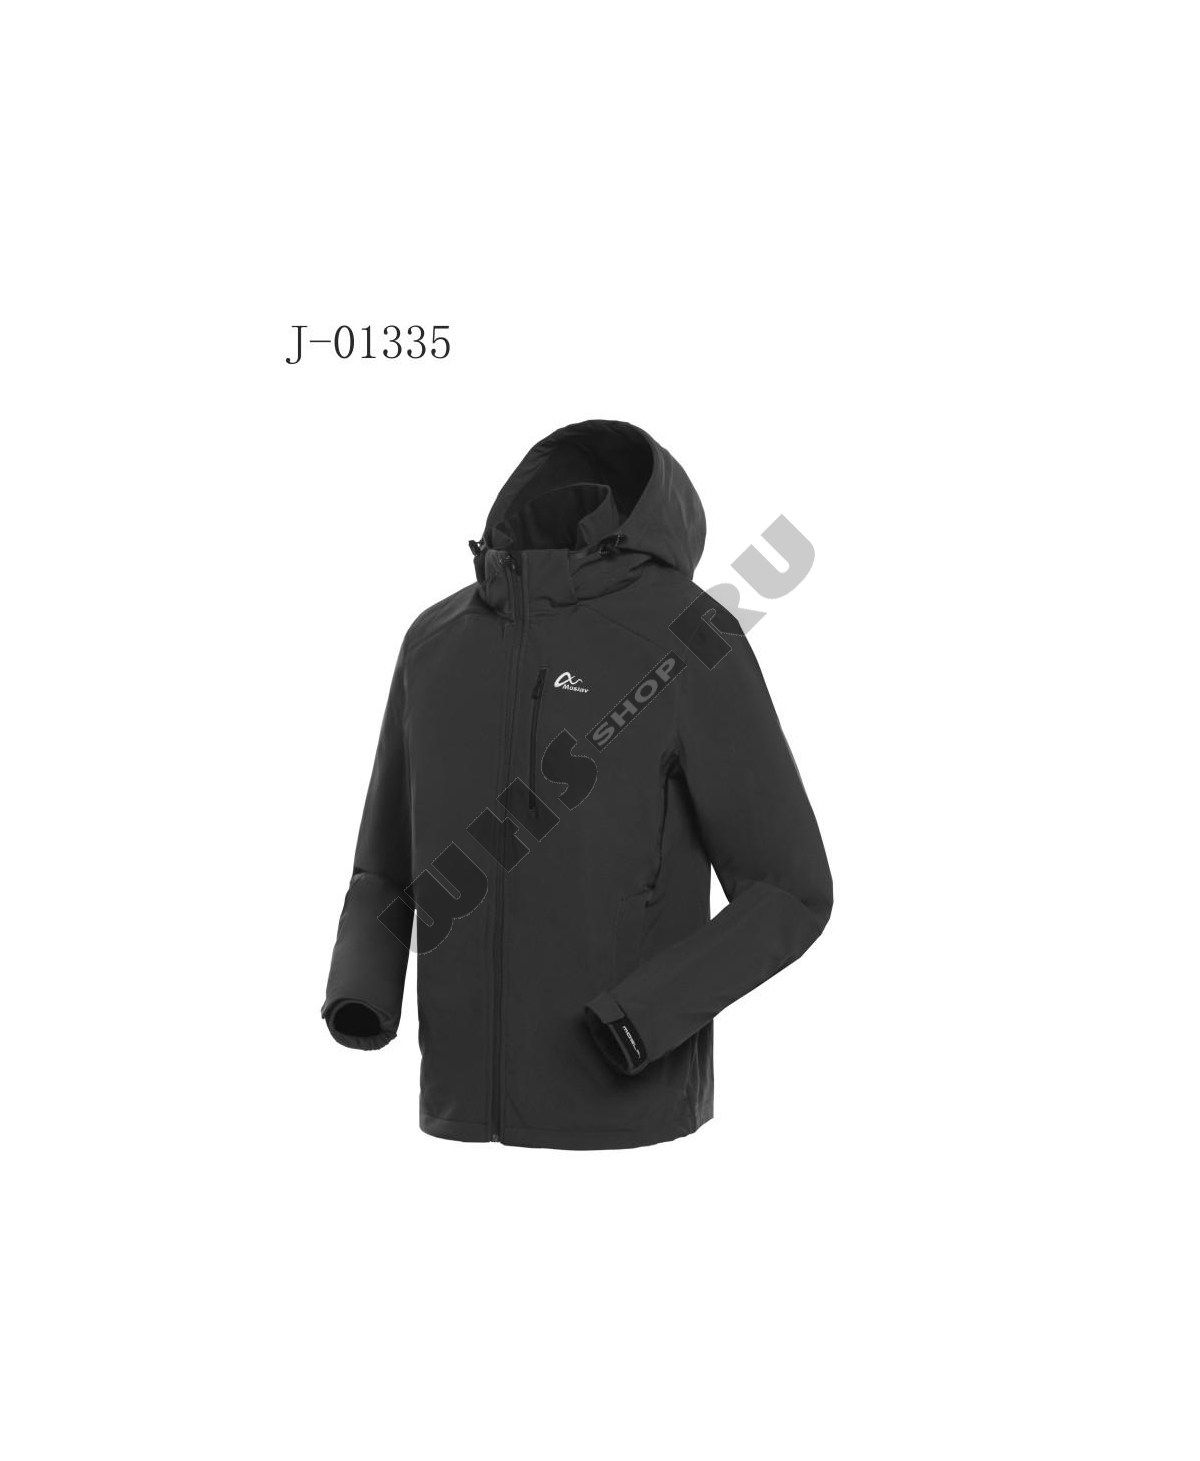 3c690a3a8e5 ✓ Куртка зимняя виндстопер Moslav J-01335 -10 °C (черная) ▫ Цена ...